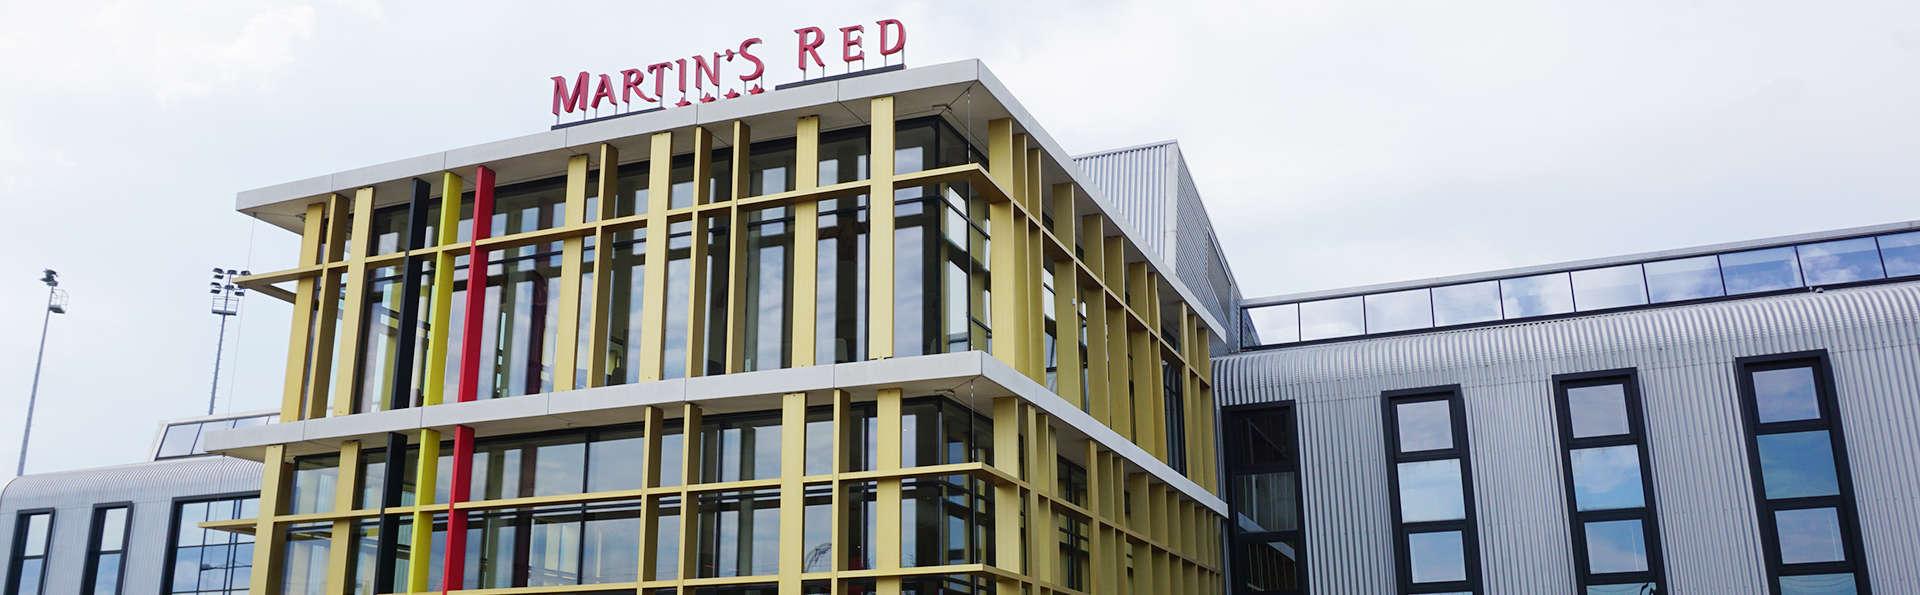 Martin's Red - EDIT_front1.jpg